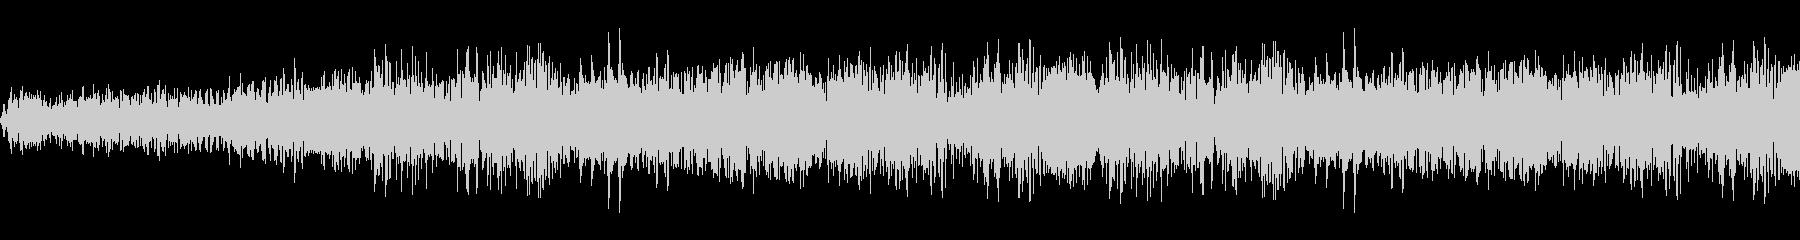 SciFi EC01_93_1の未再生の波形